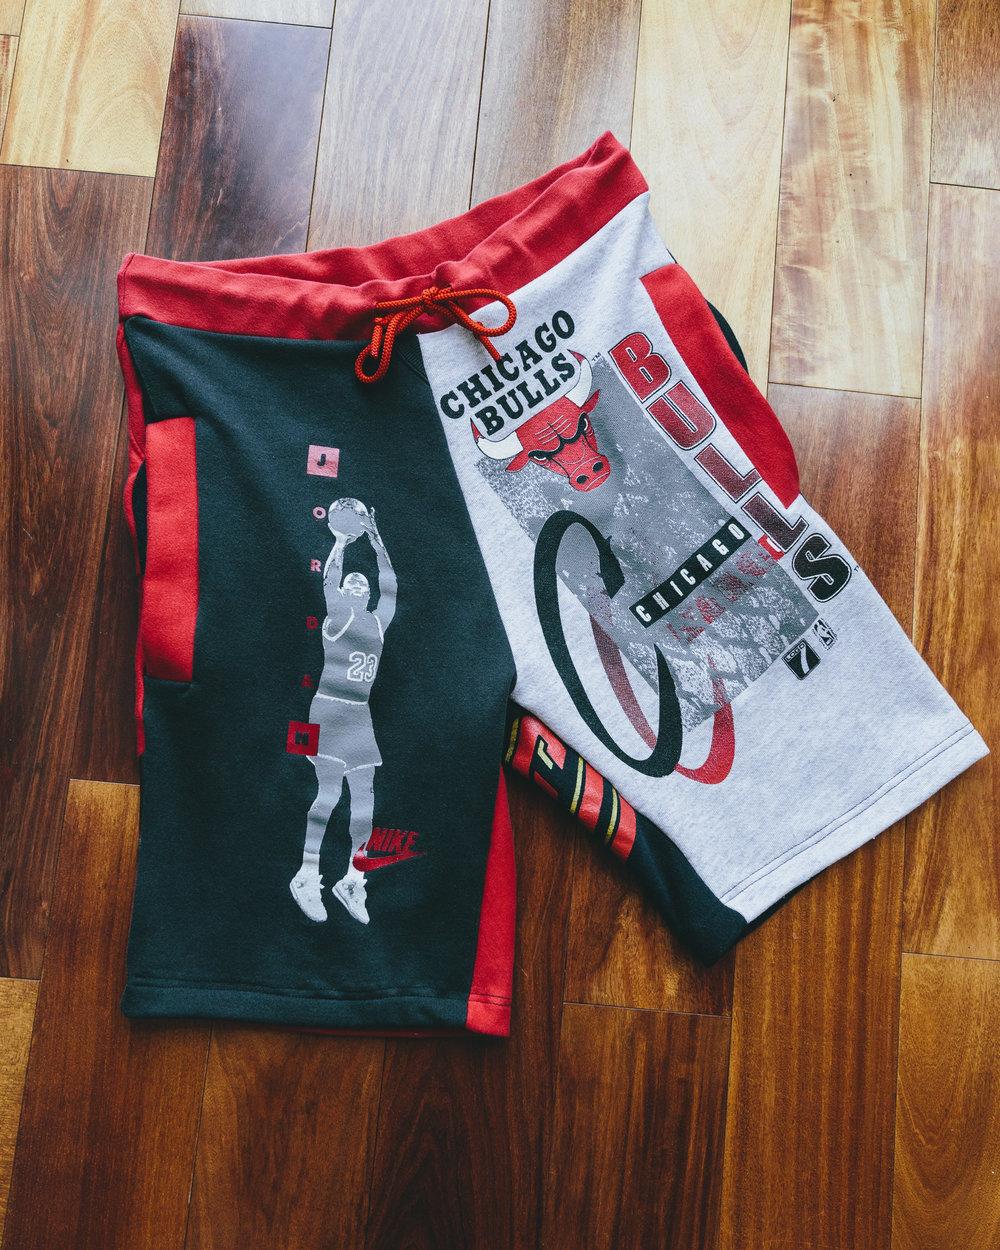 Bulls Shorts - Commissioned piece bulls themed